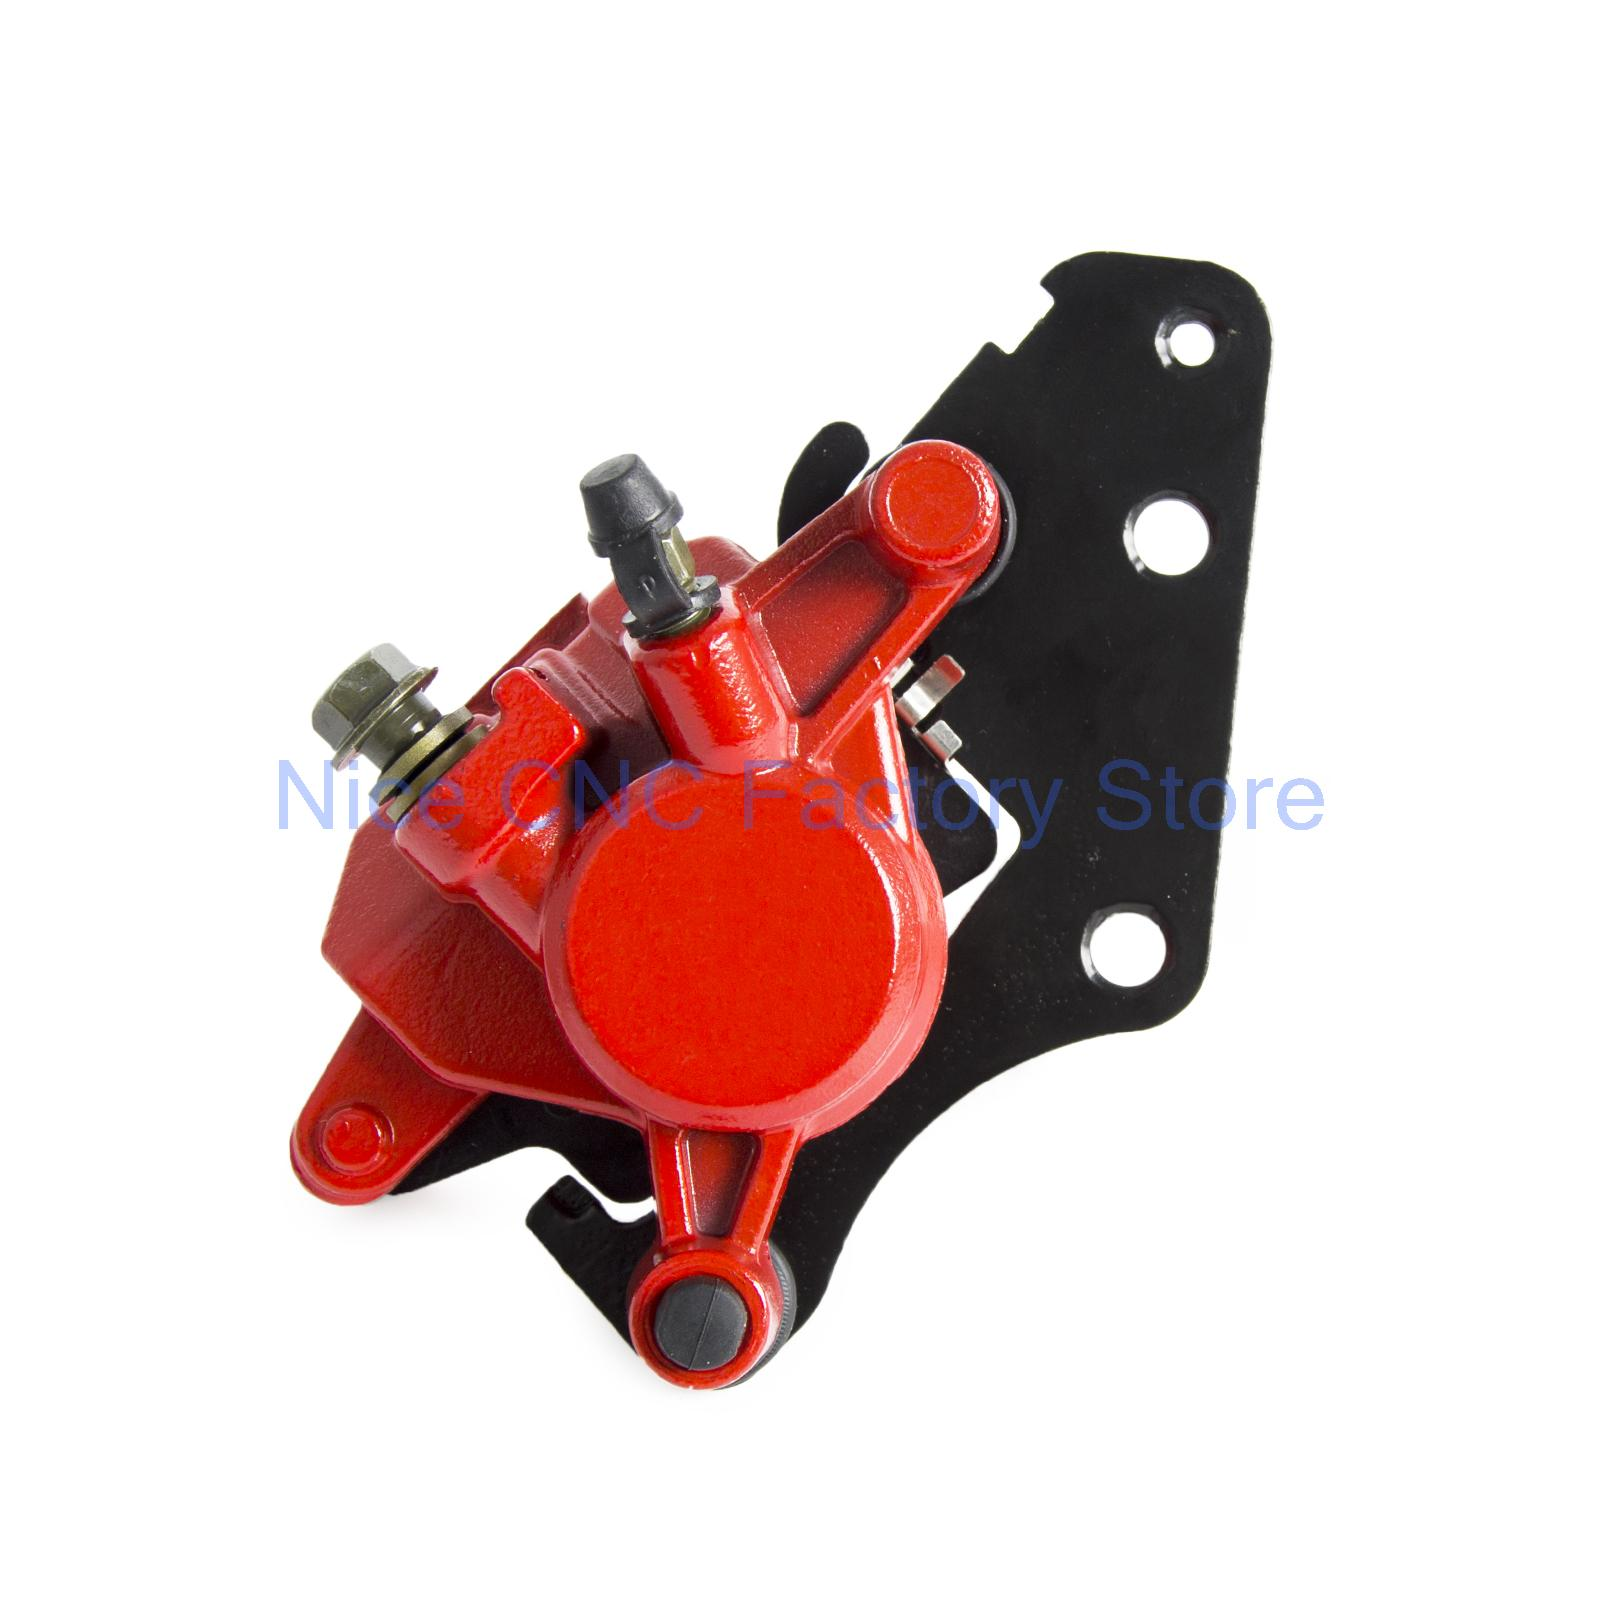 Brake Caliper Assy With Pads For Yamaha XC125E Axis Treet E53J 2009 - 2013 210 2011 2012 Number: 32P-F580U-11-00